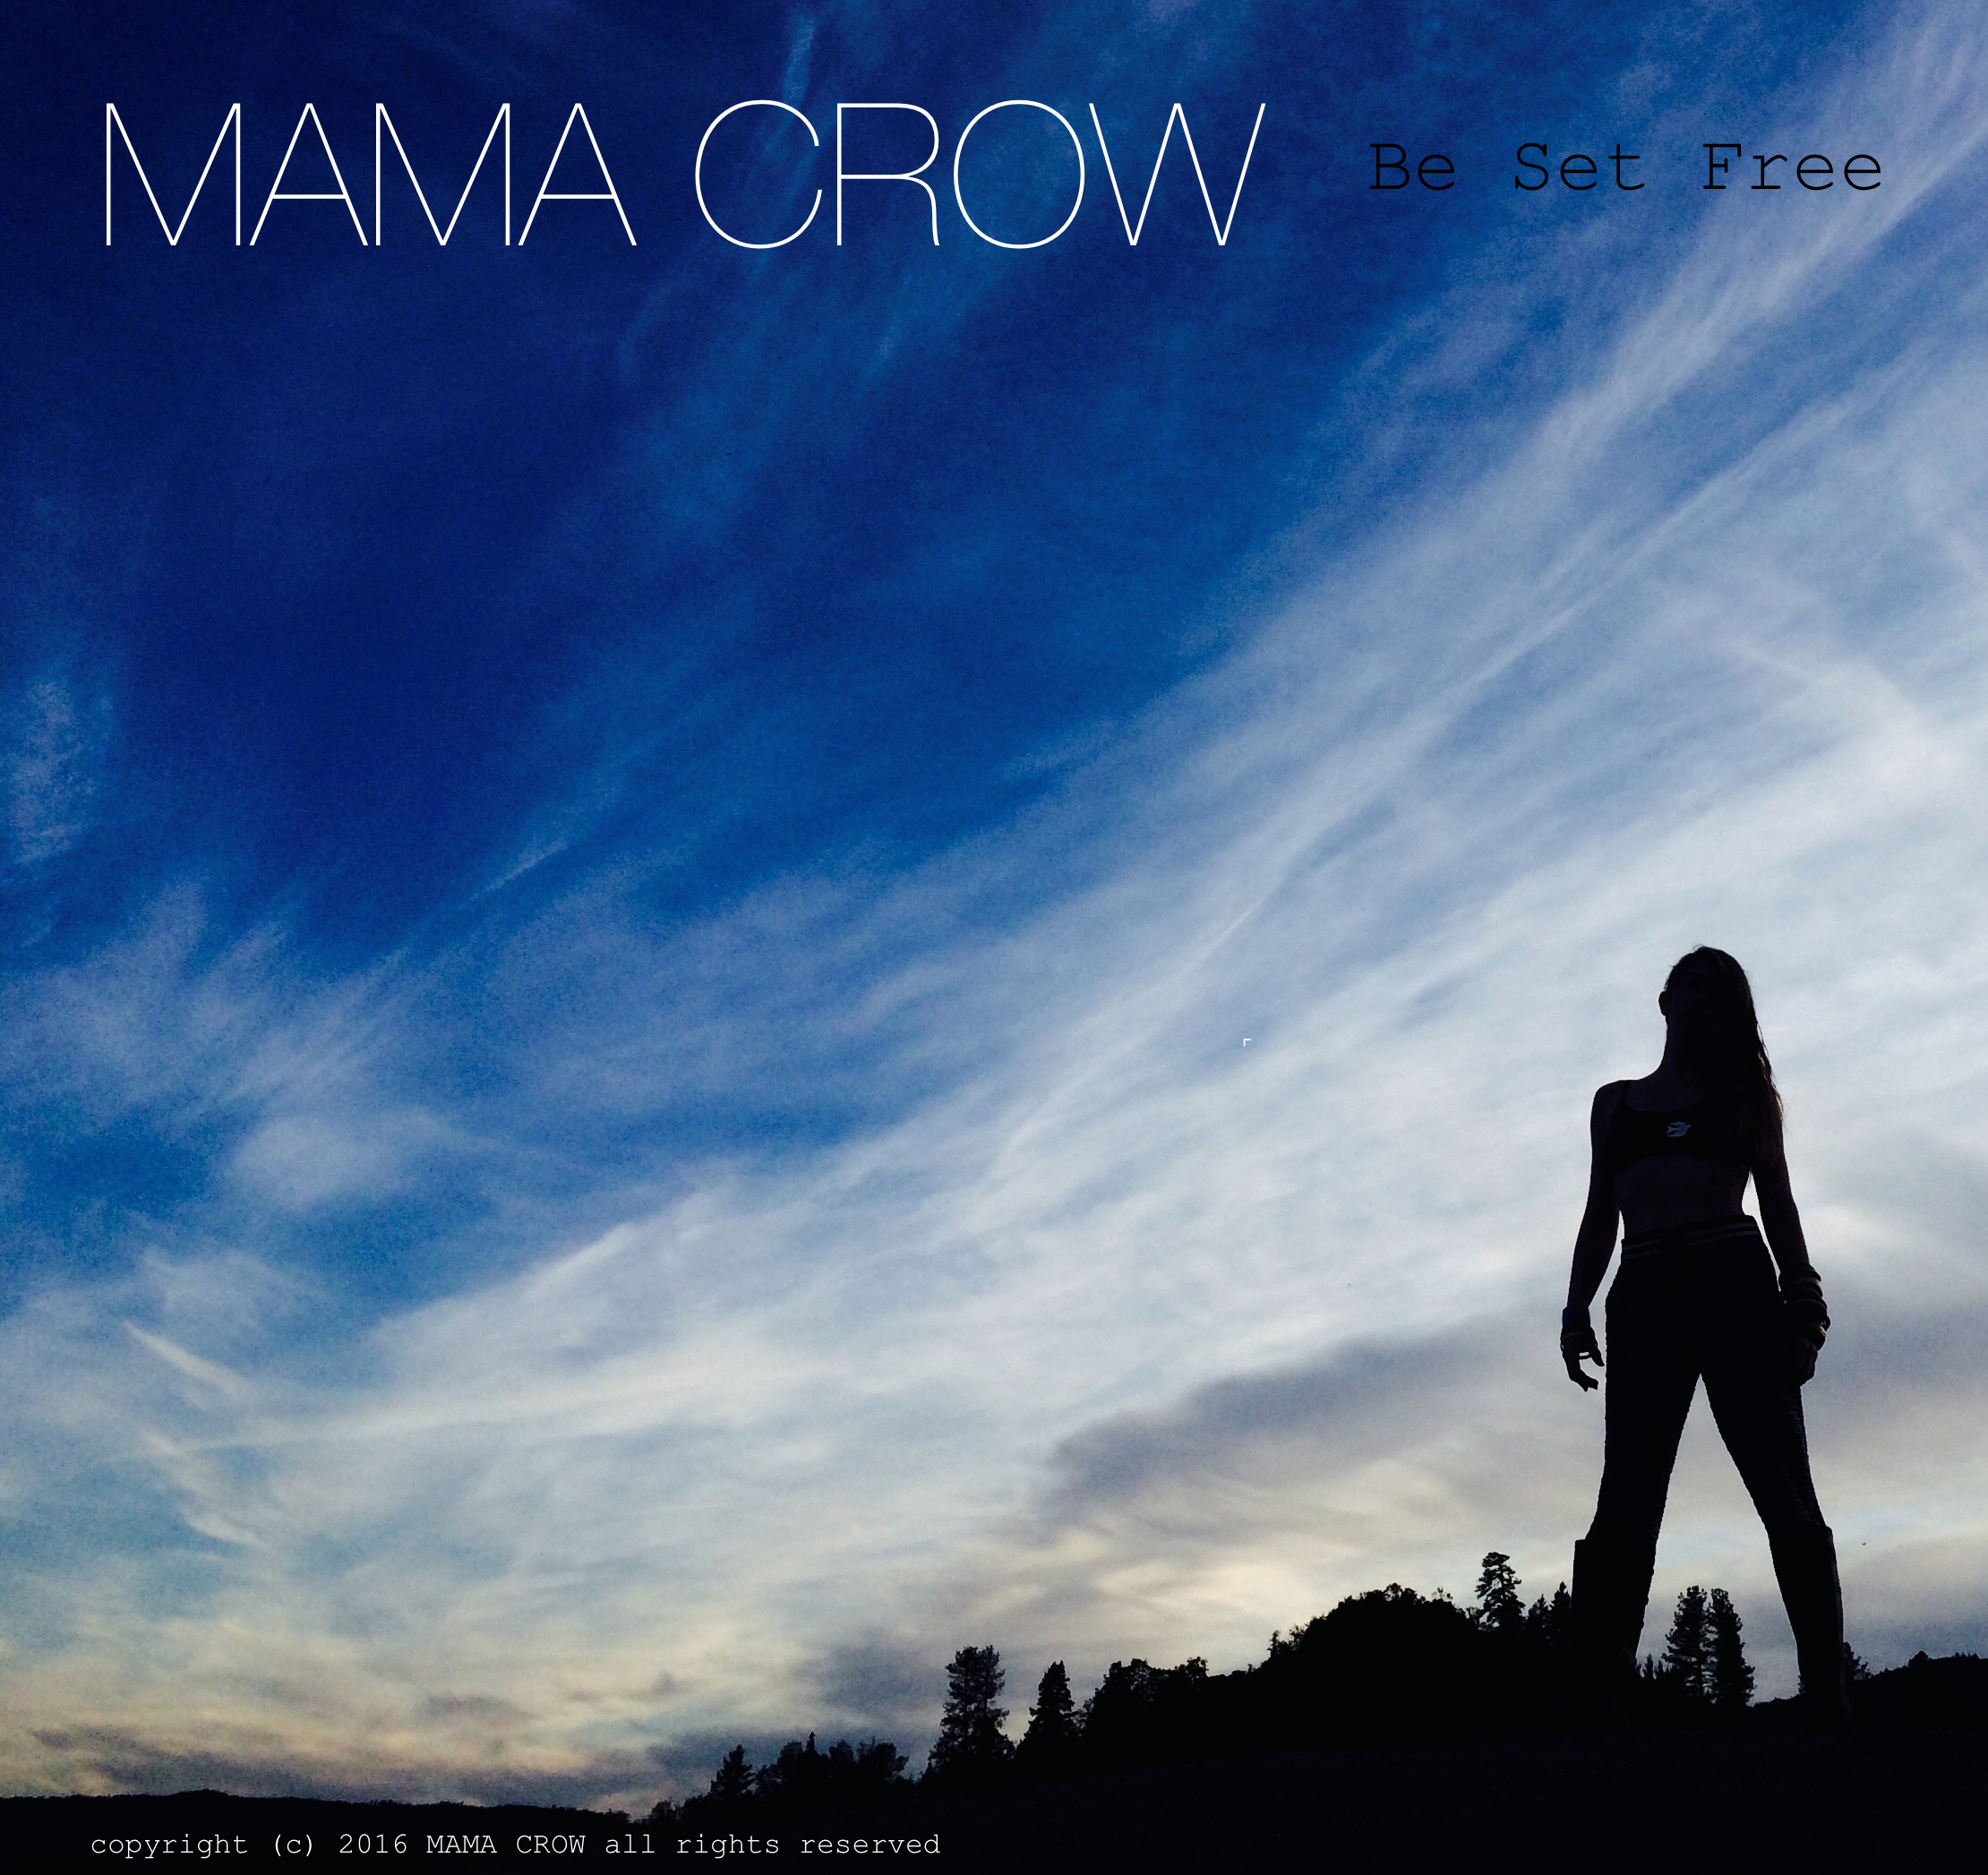 Mama Crow Be Set Free CD art.jpg